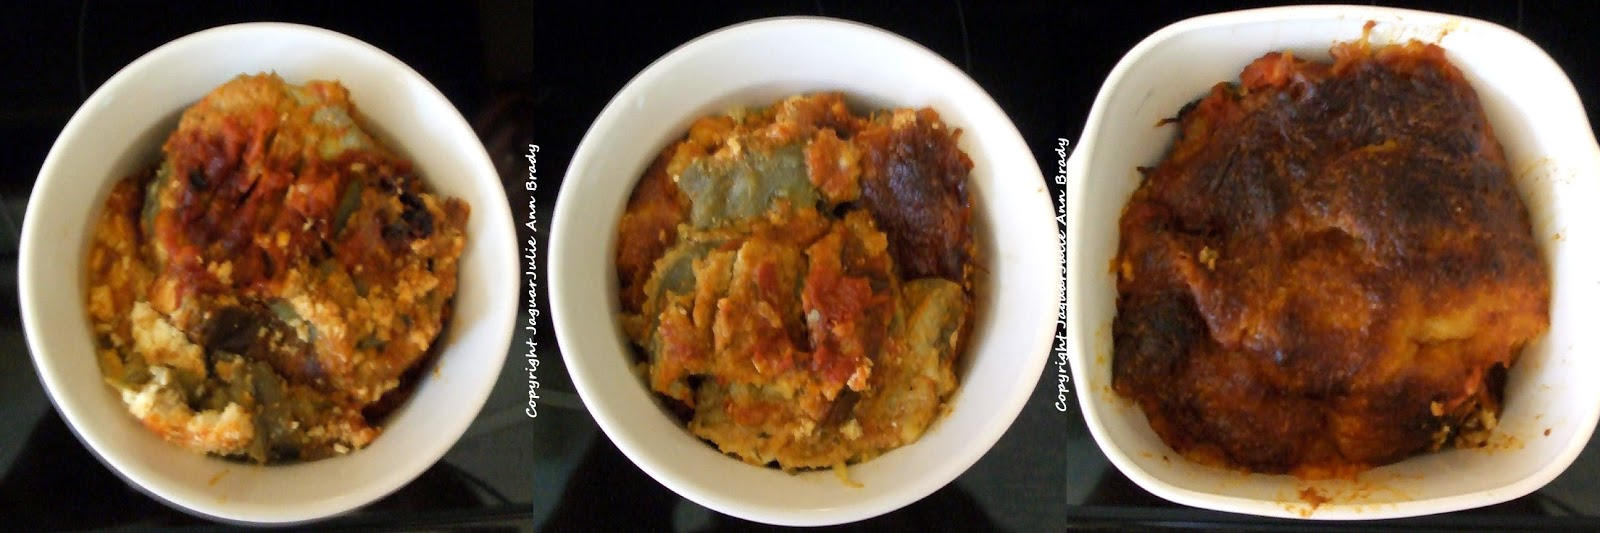 My Baked Eggplant Parmesan Recipe - Freezer Dishes